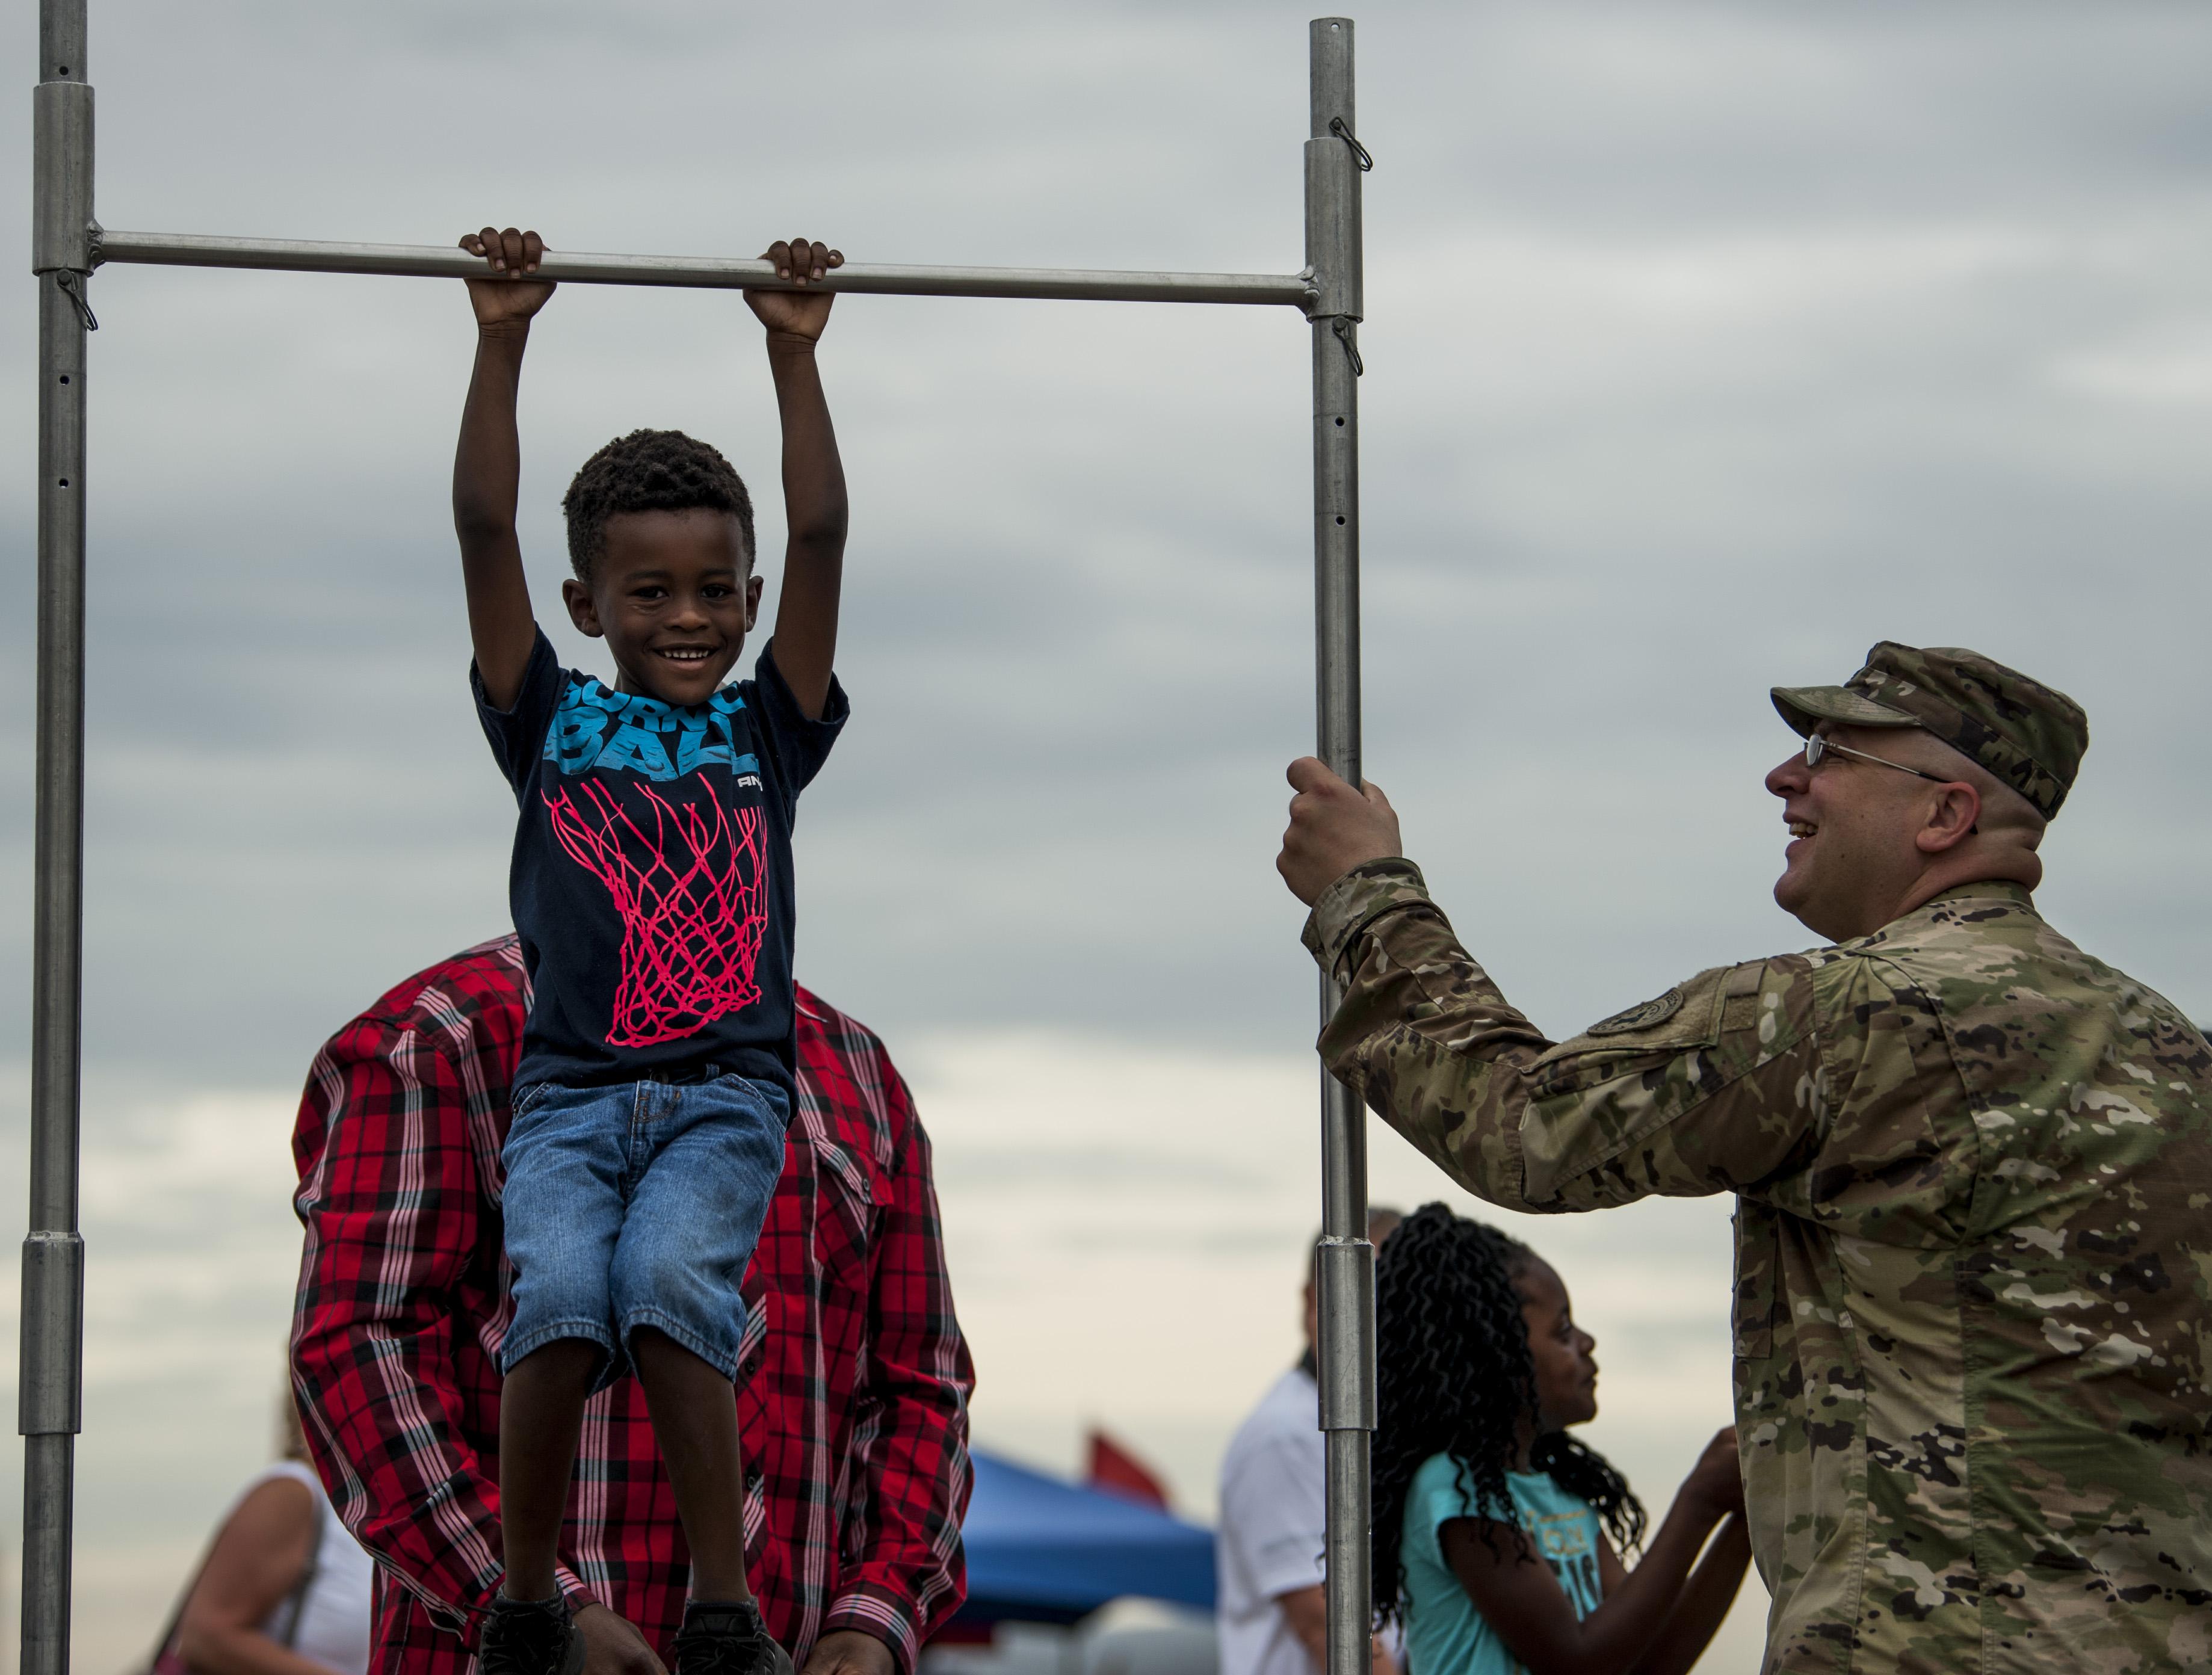 998ad7af369 A child tries out a pull-up bar at a U.S. Army recruitment tent during